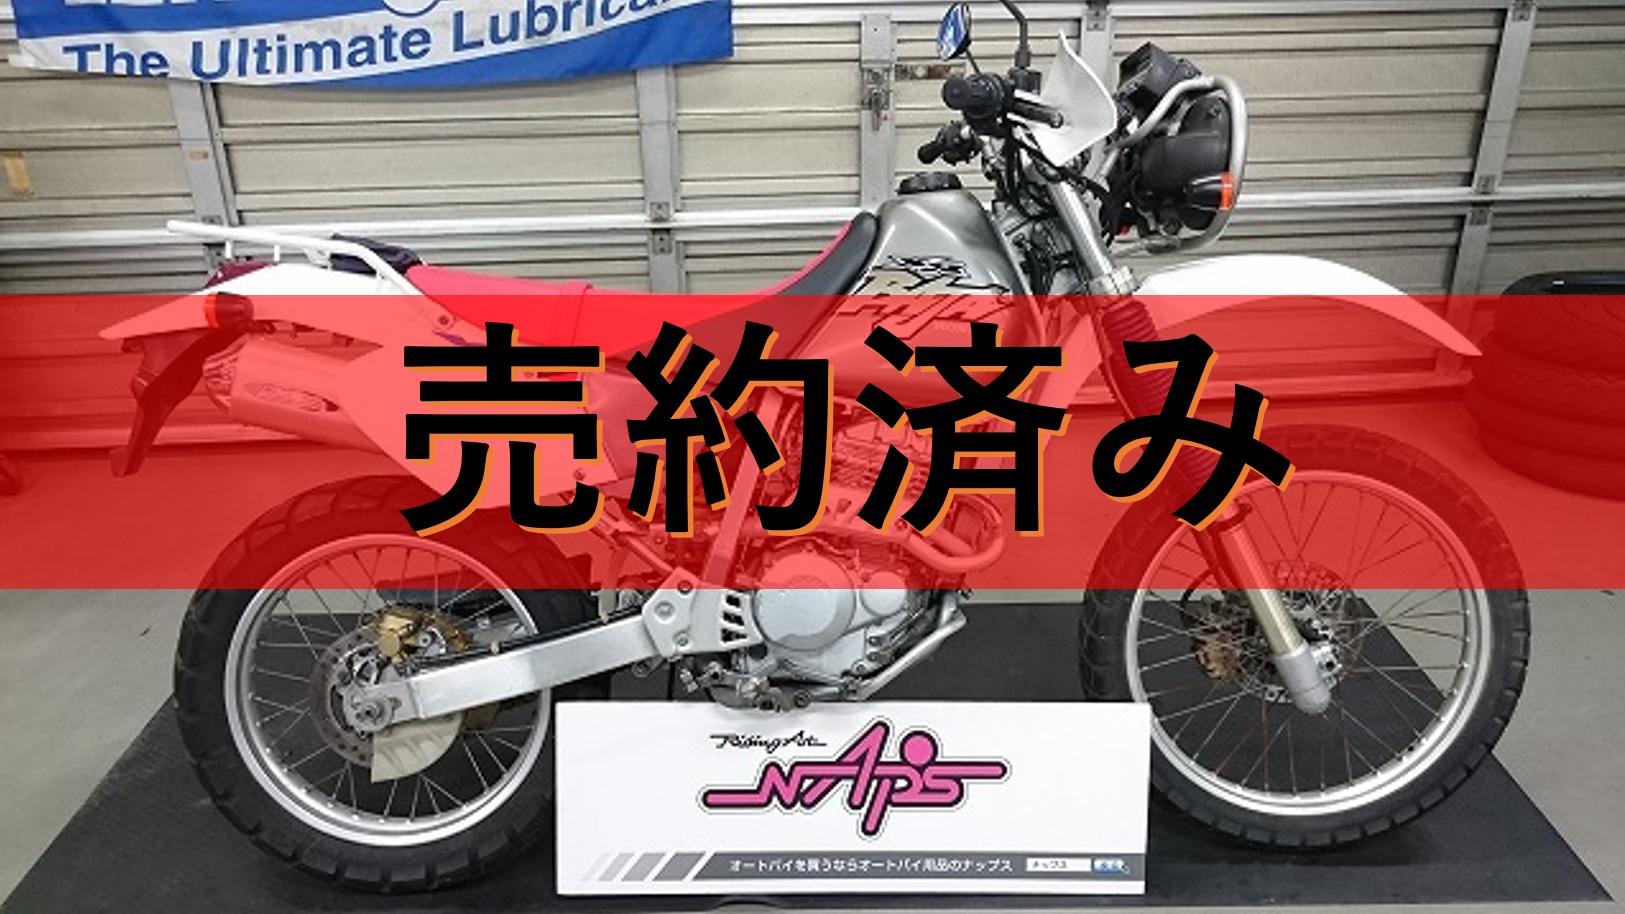 HONDA 【販売車両】XR BAJA 社外サイレンサー/リアキャリア付き